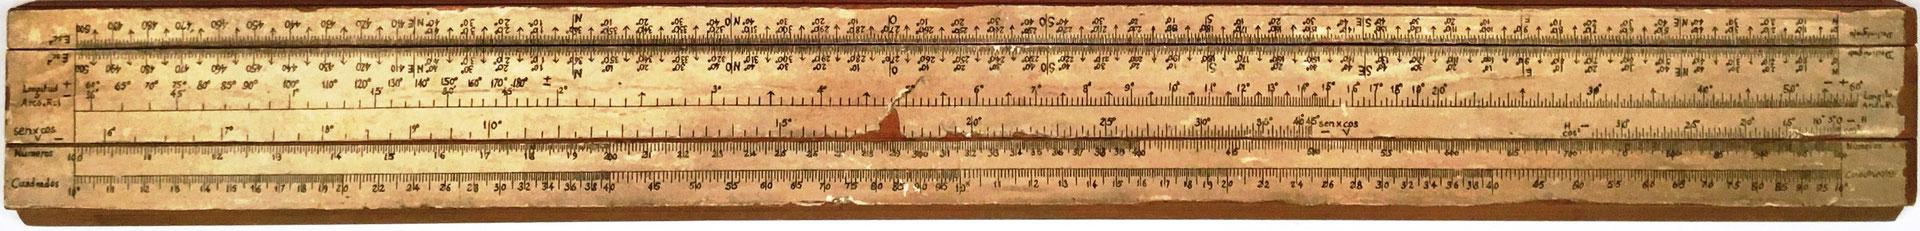 Primitiva Regla Topográfica española marca CONDE (modelo 1), 43x5 cm